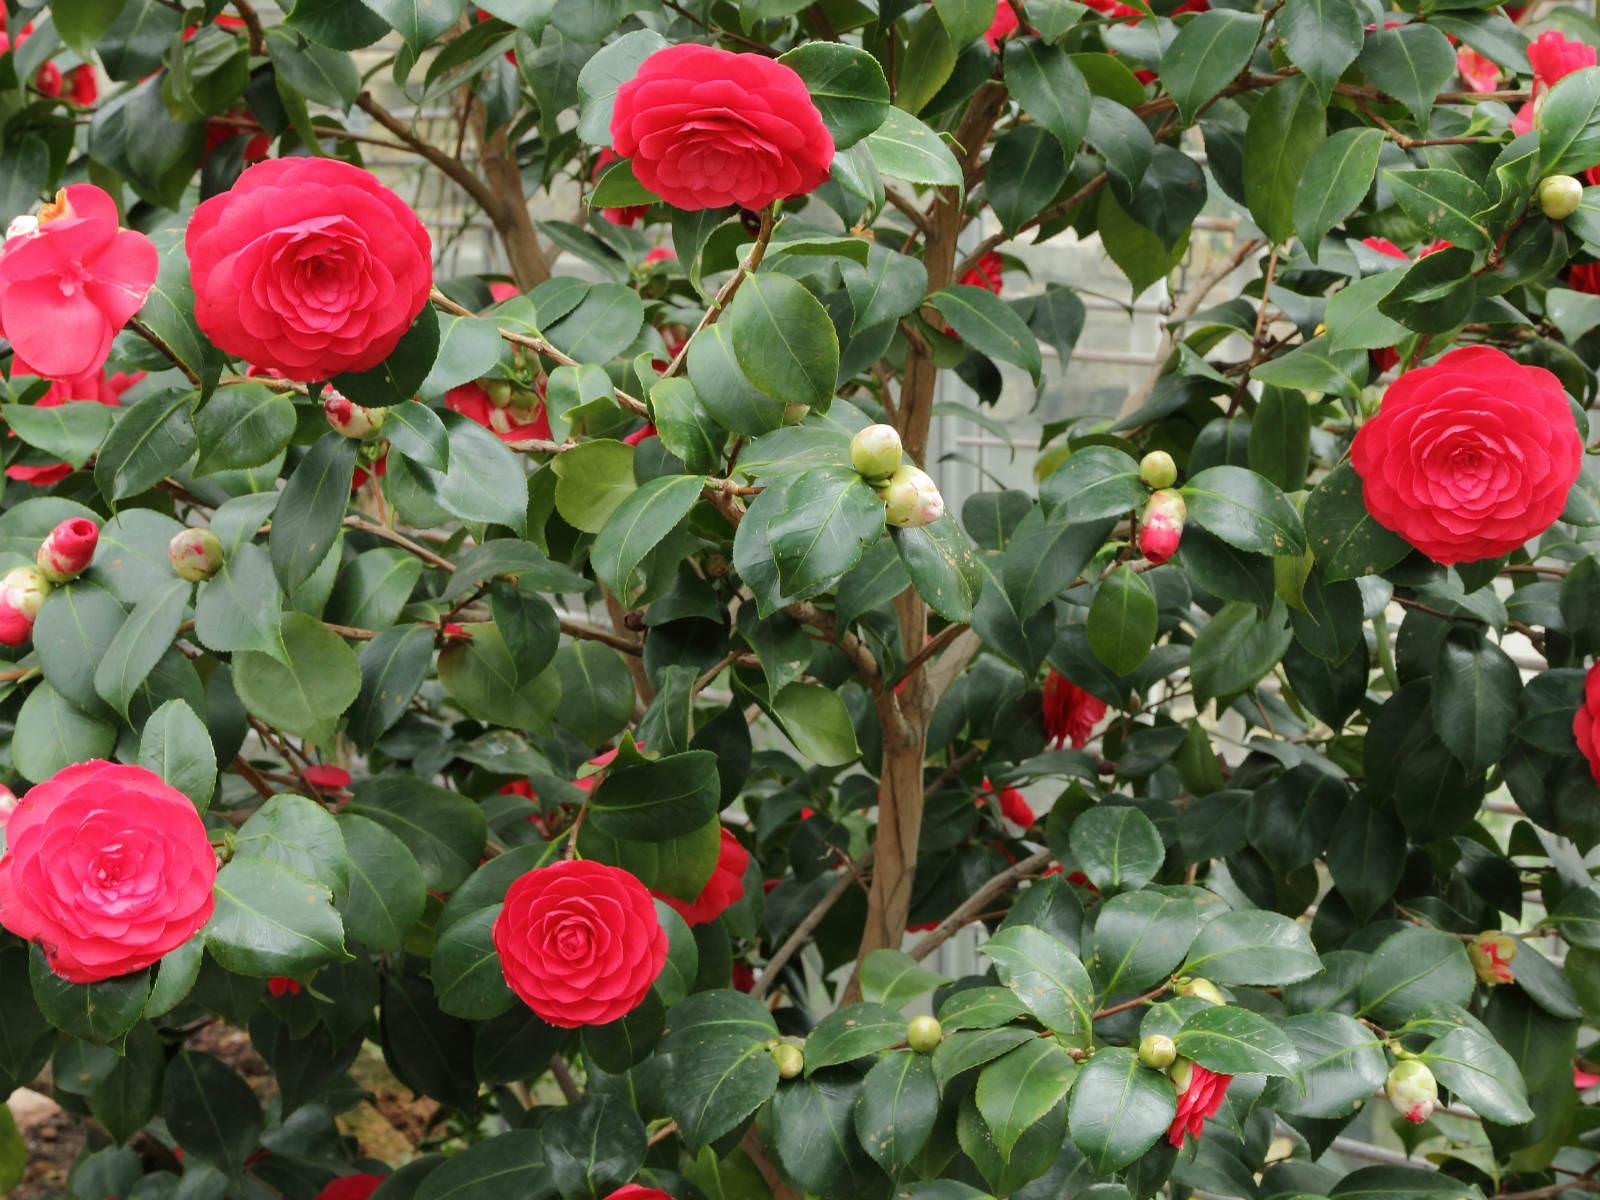 Camellia japonica japanese camellia rose of winter - Camelia planta ...